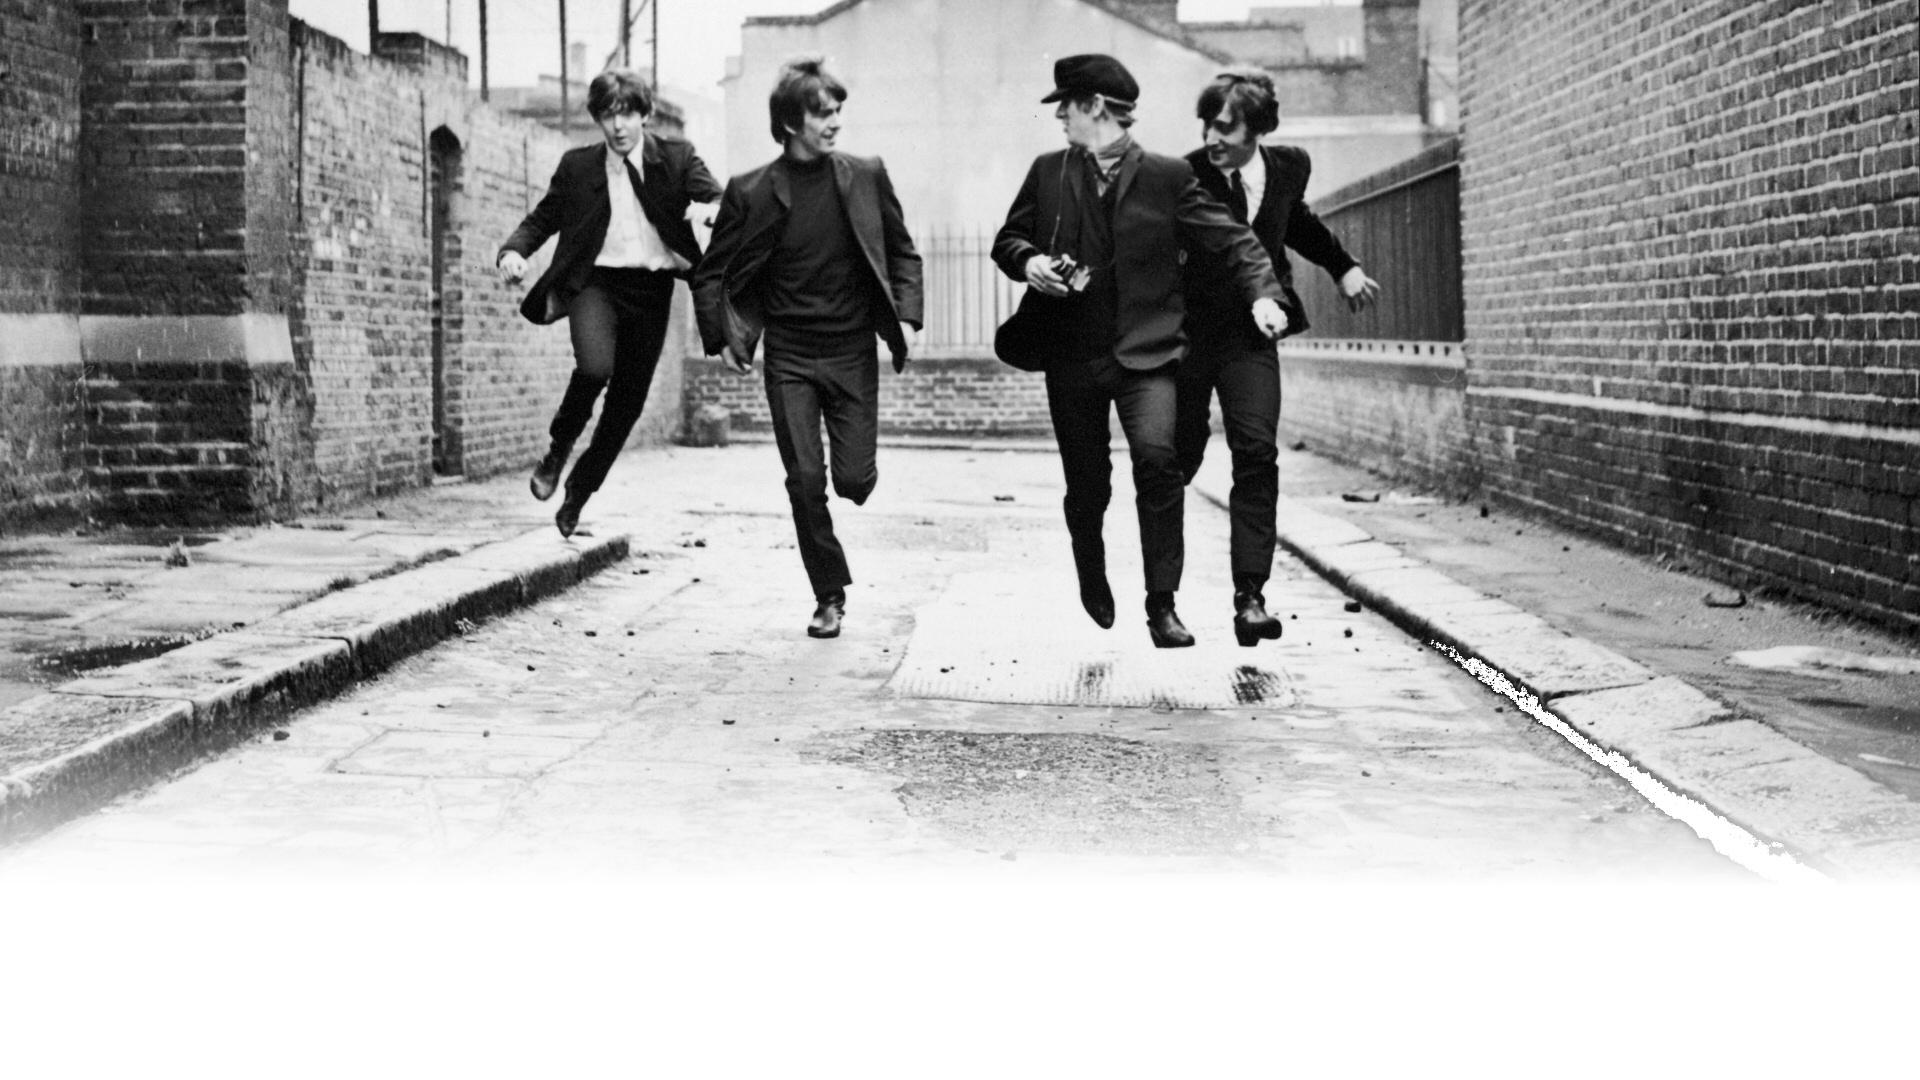 Black Monochrome Street Winter Road Photography Gentleman Band Standing The Beatles Run Walking Infrastructure Pedestrian Girl